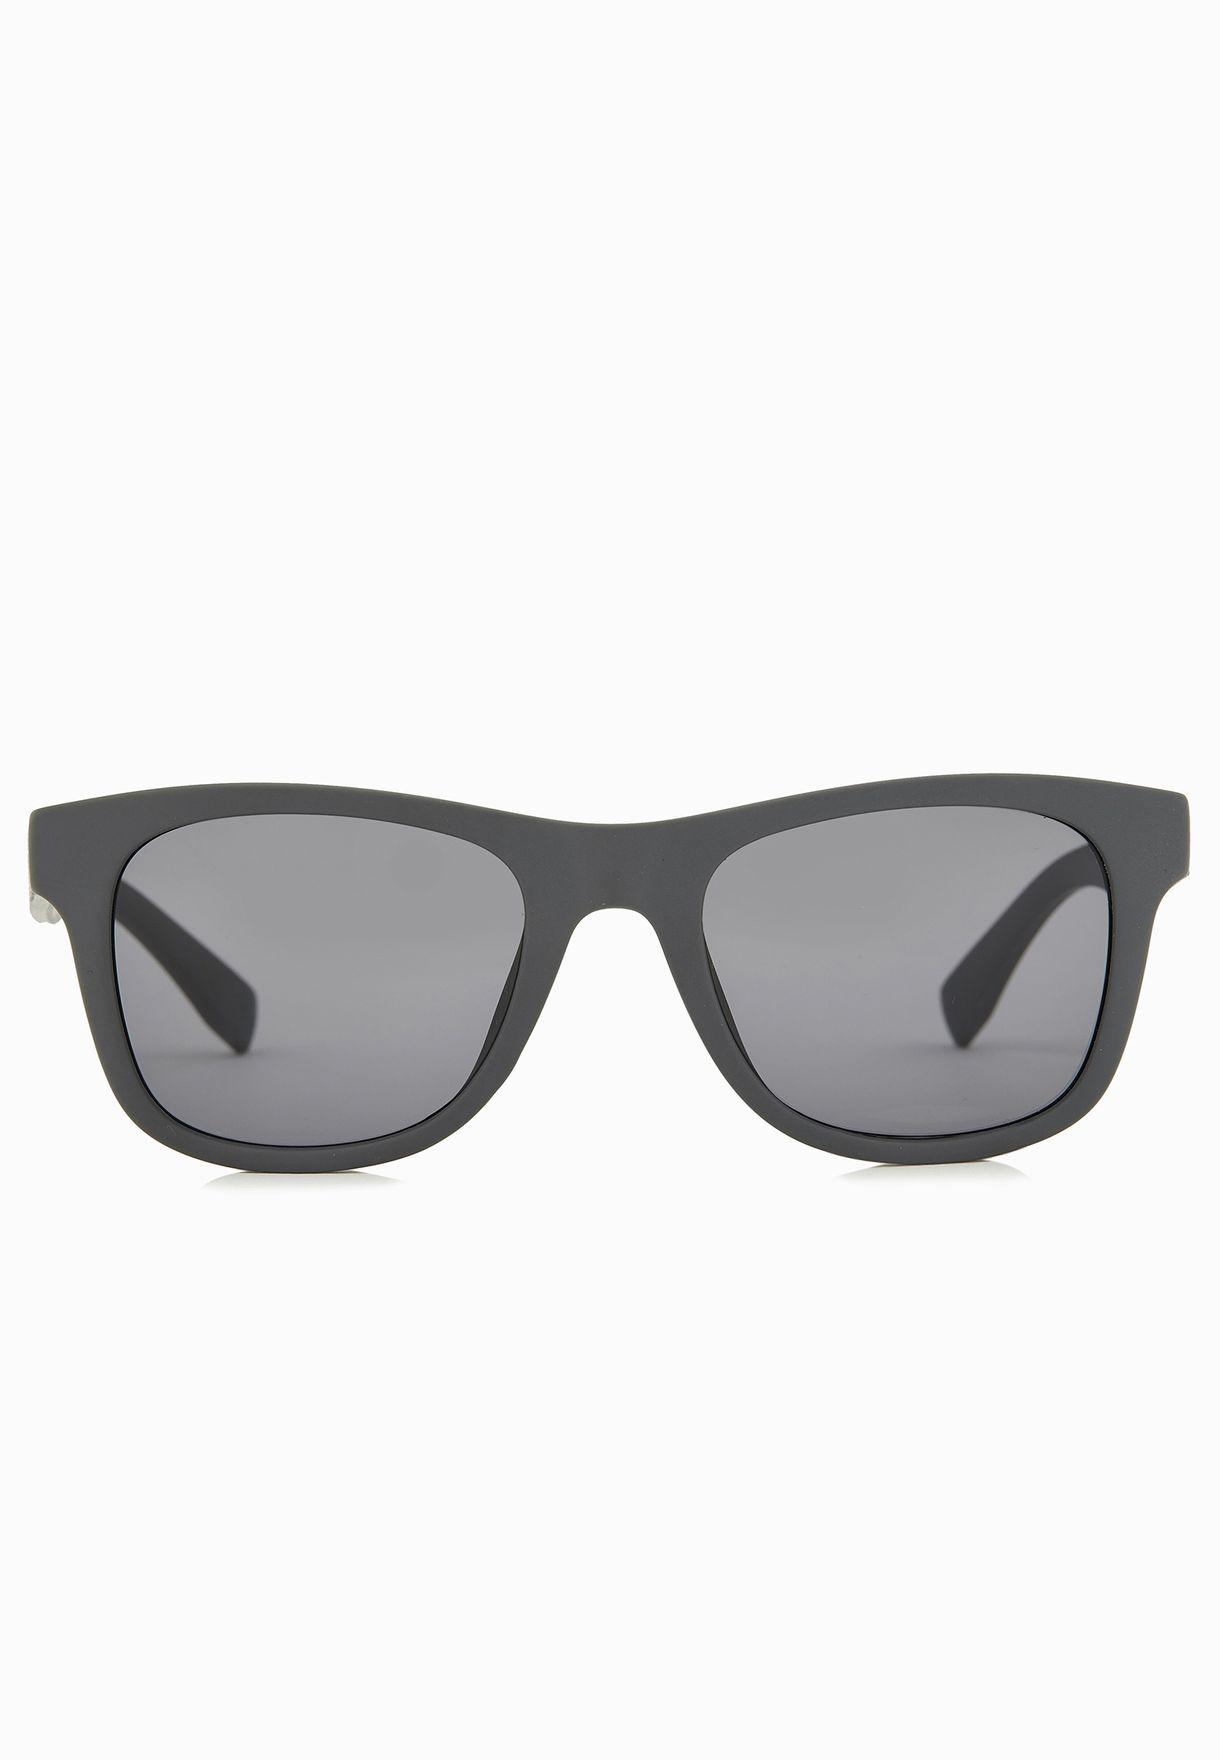 Petit Pique' Rectangle Sunglasses